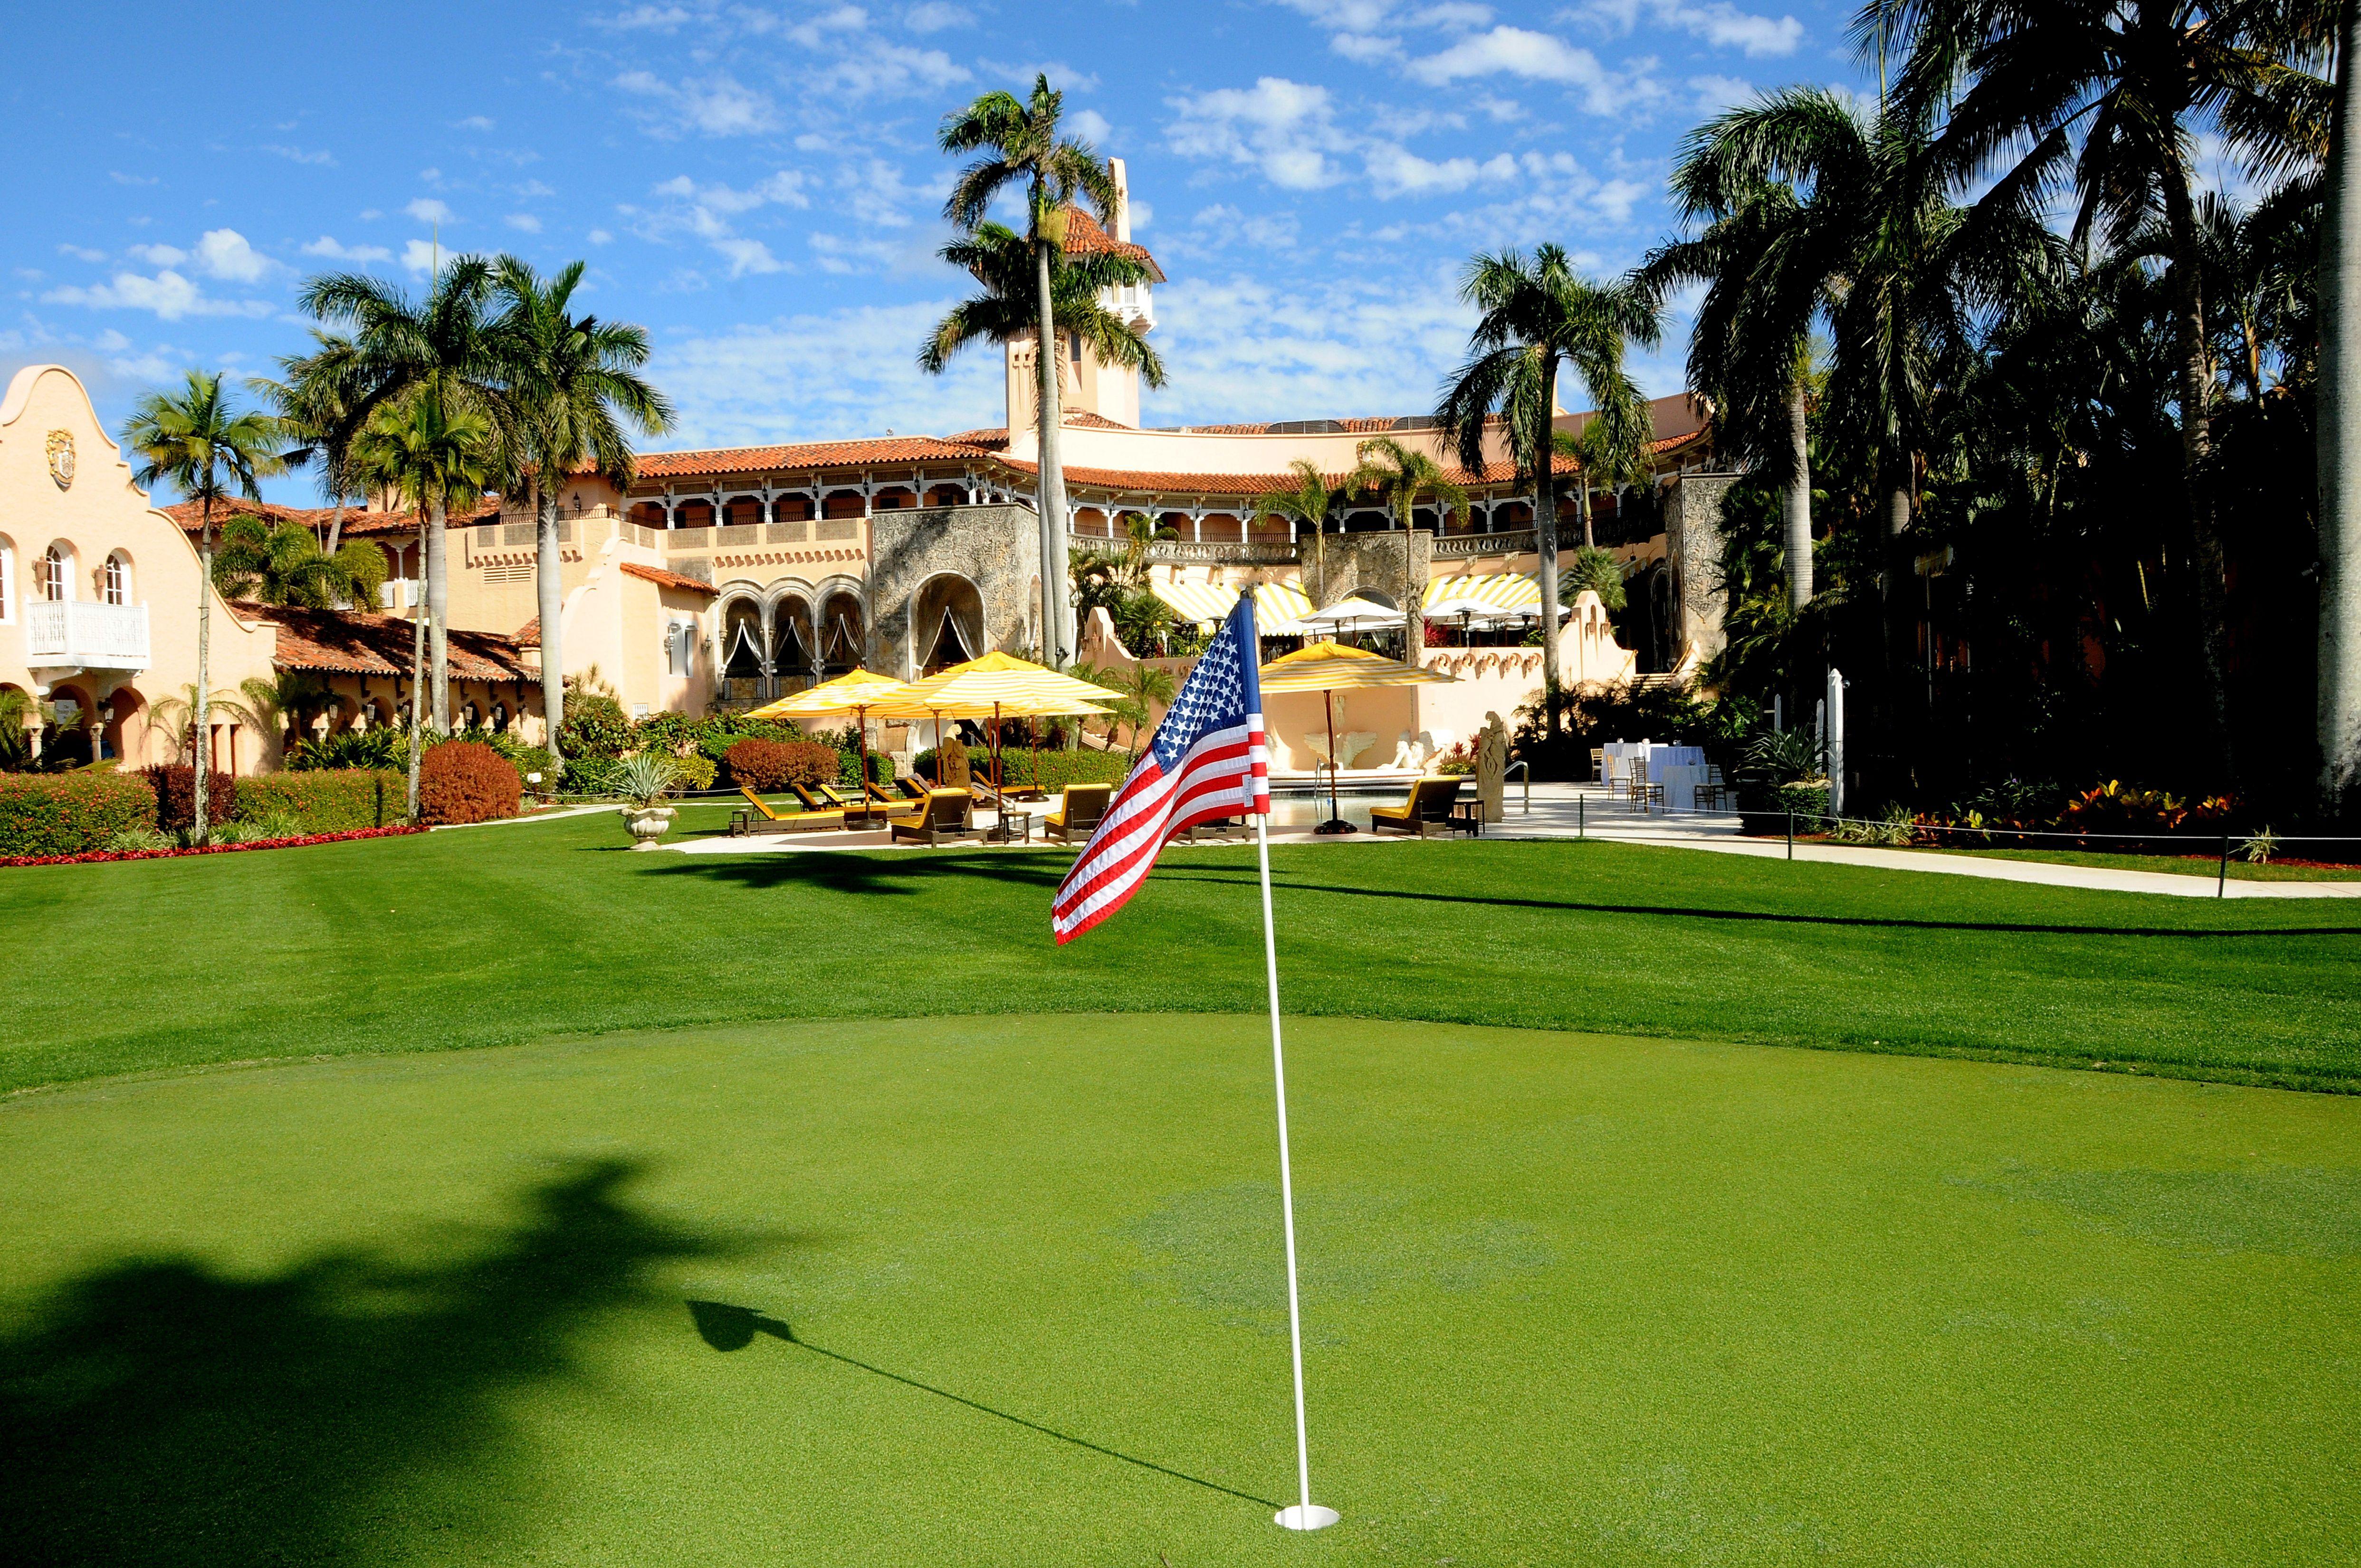 Putting green behind the Mar-a-Lago Club